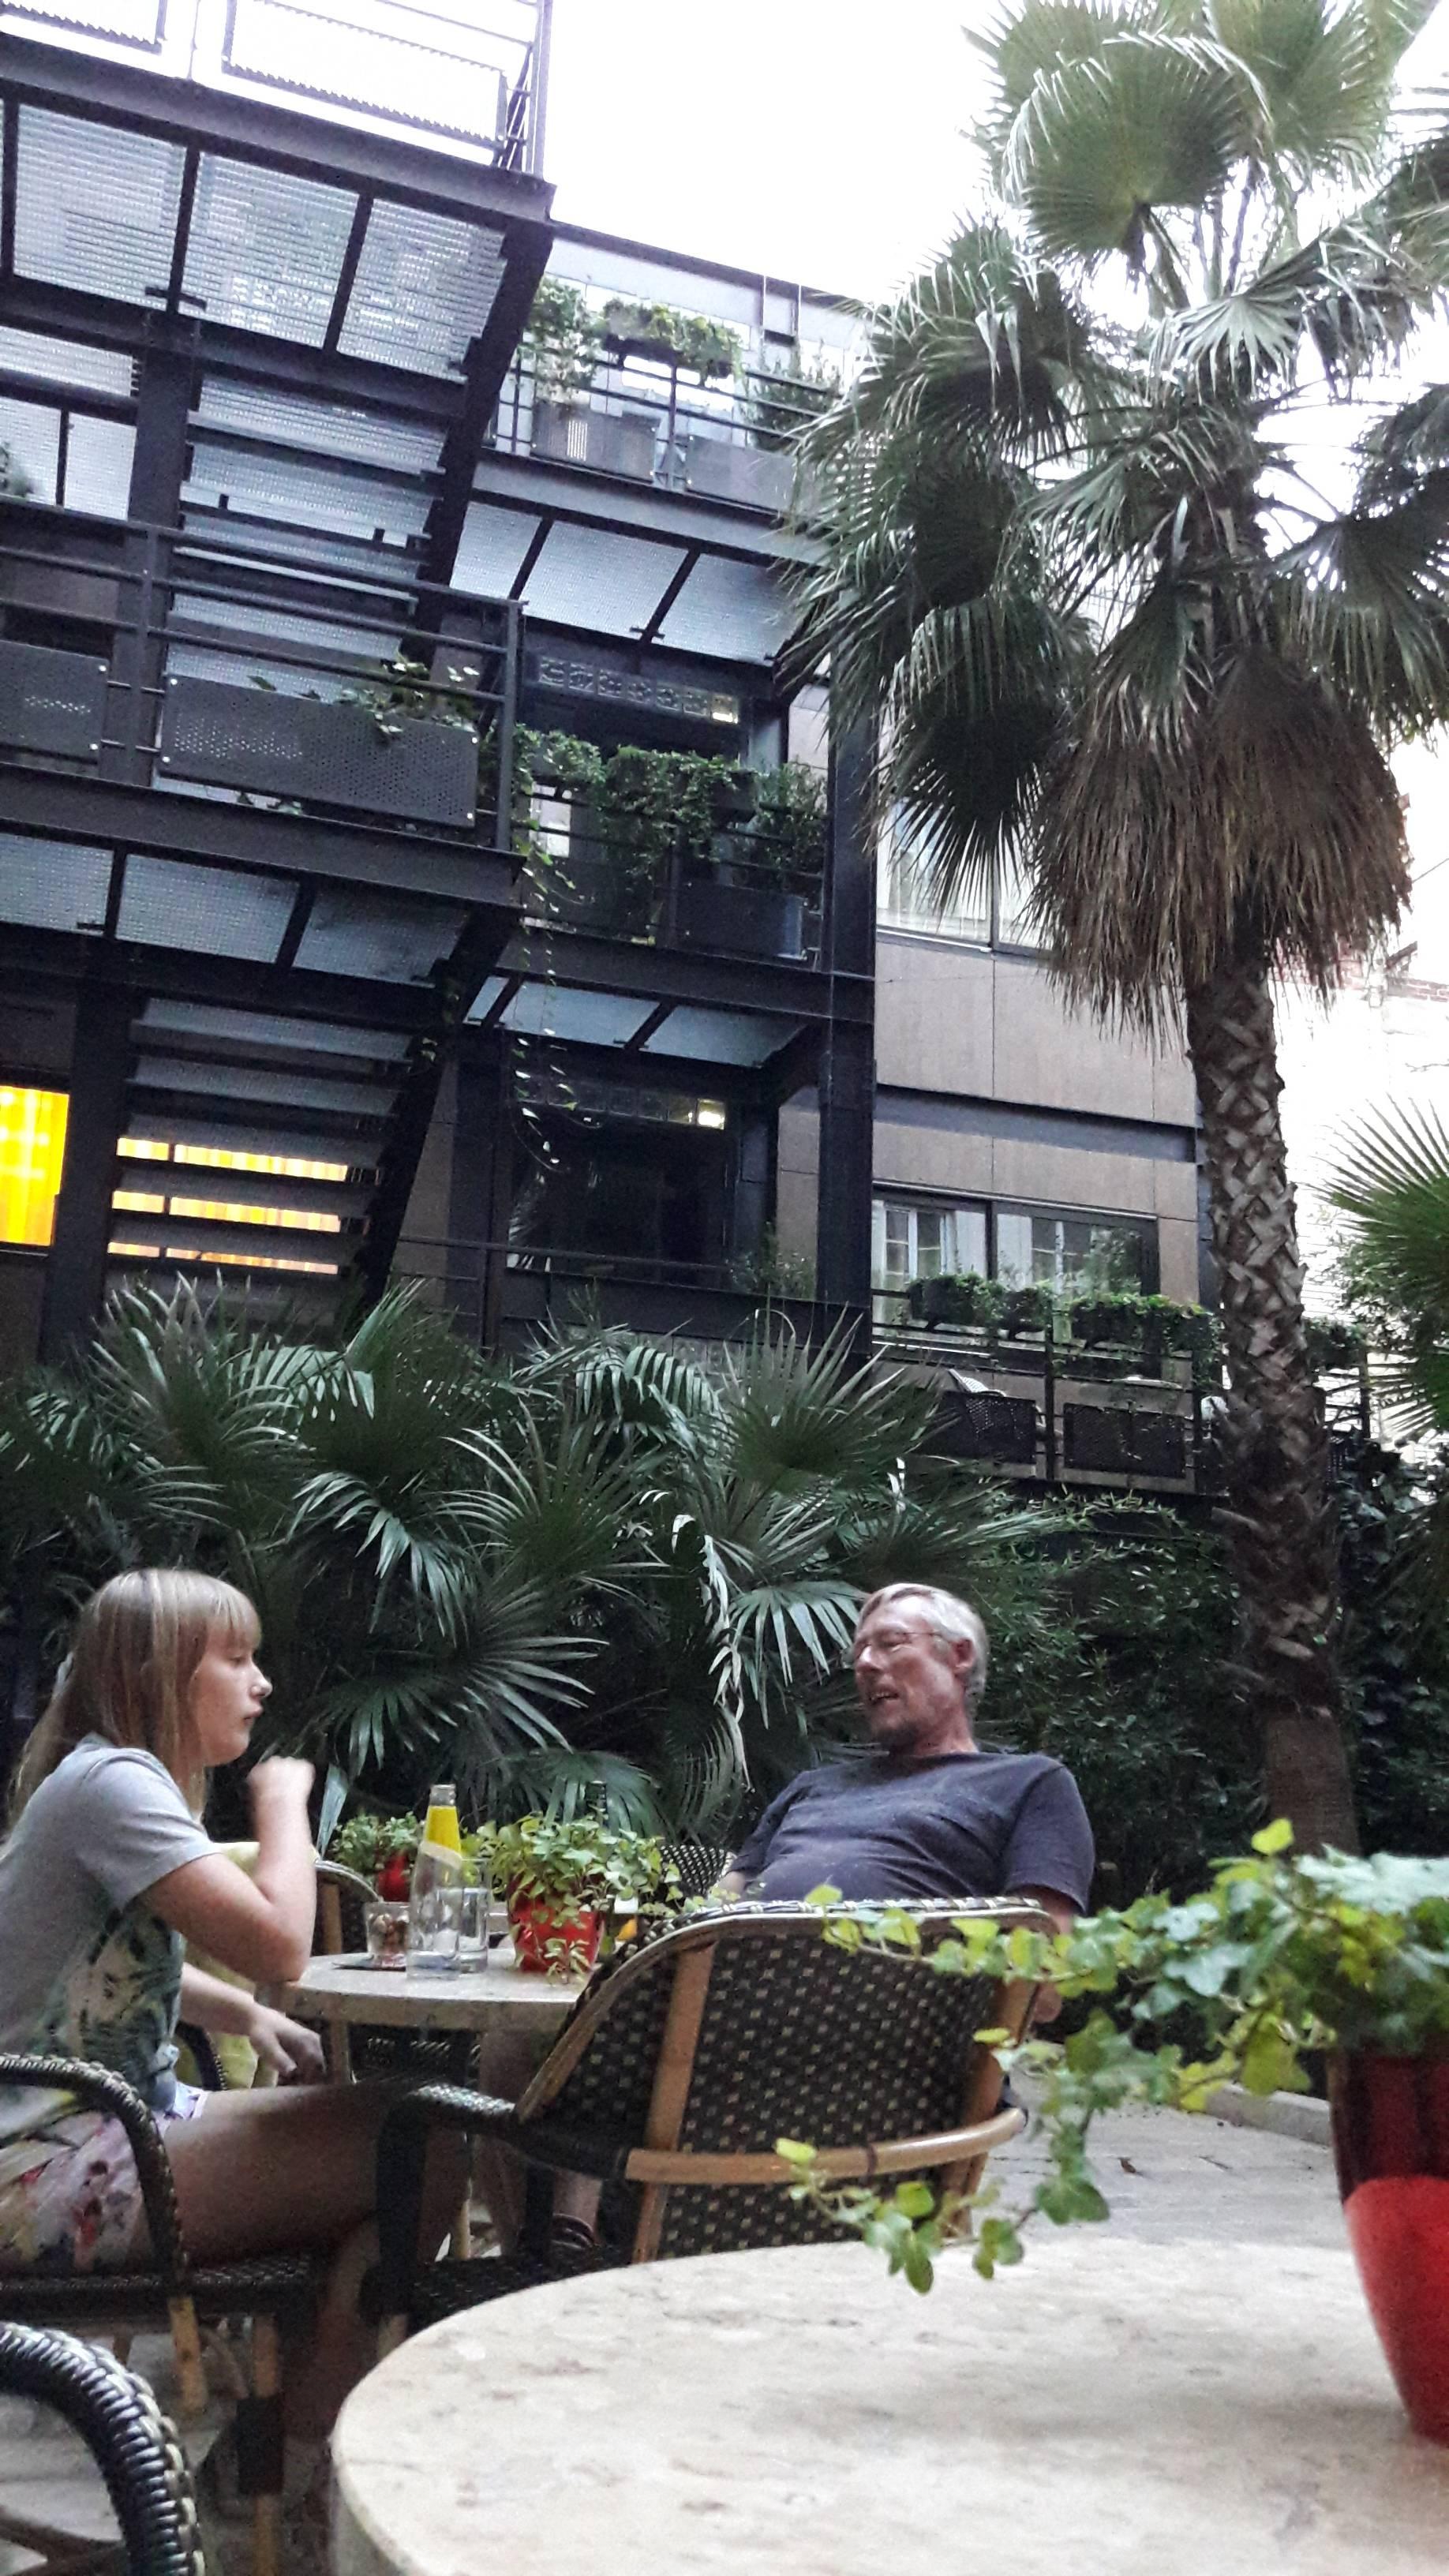 Photo 1: Hôtel Beauséjour pour sa terrasse secrète